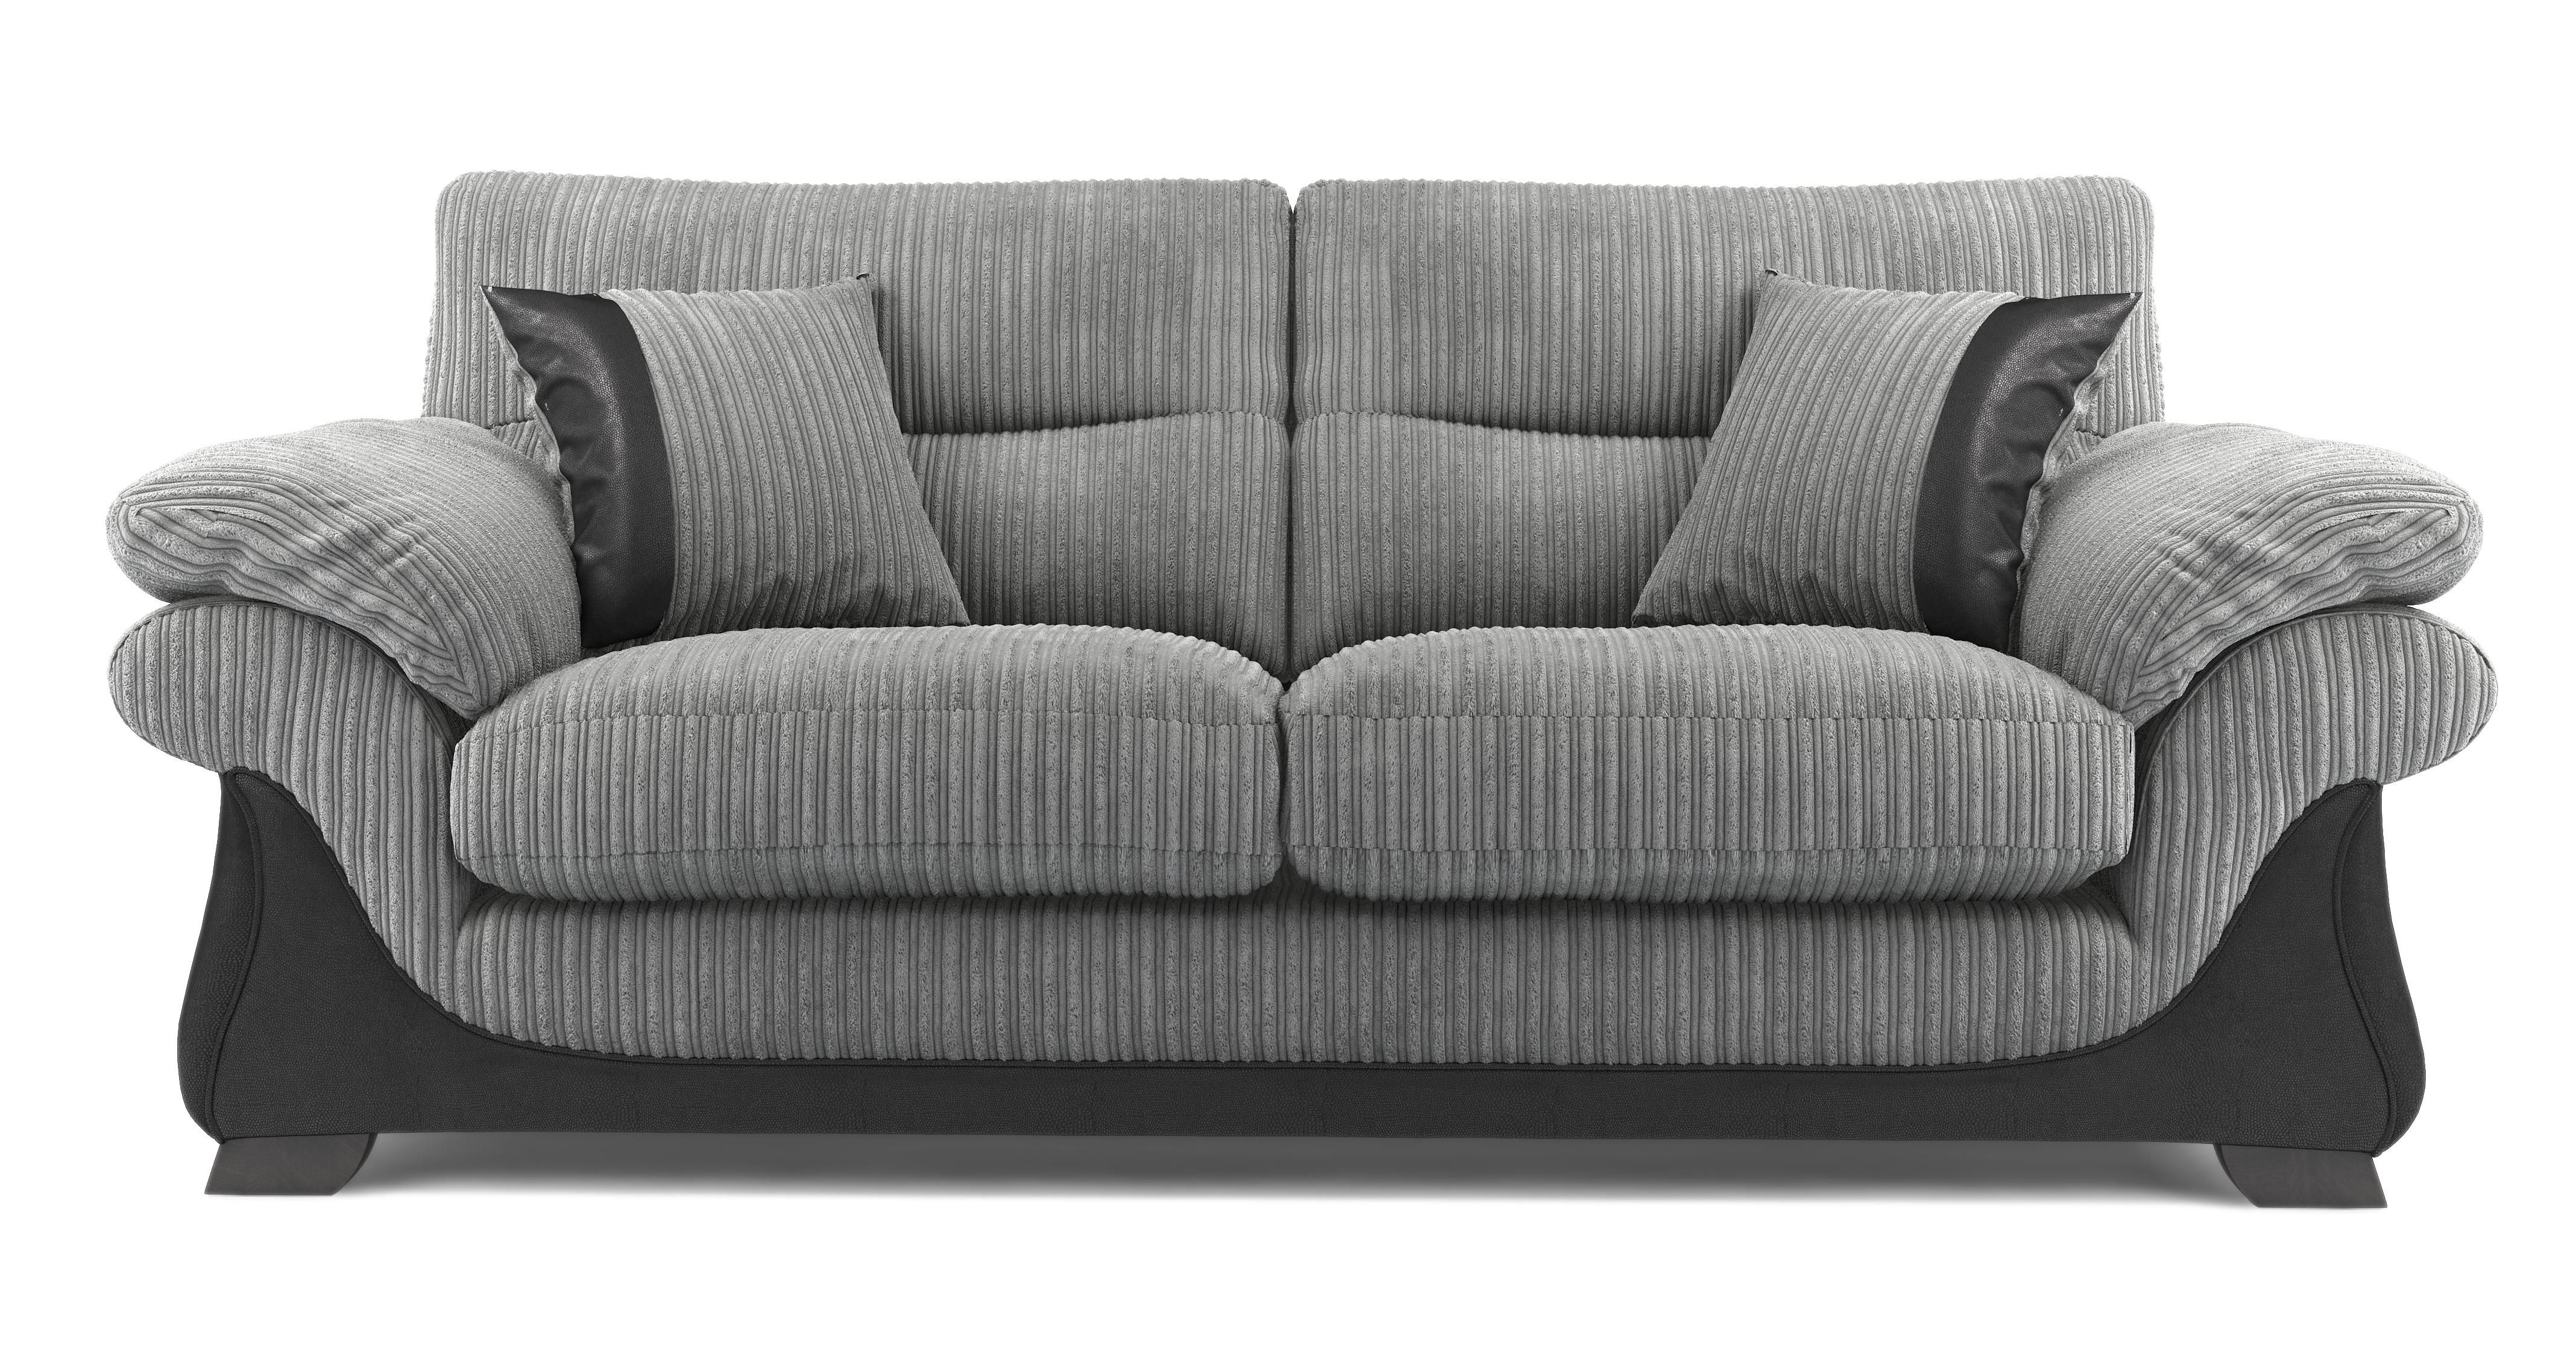 Conga 3 Seater Sofa Landon DFS Stuff to Buy Pinterest